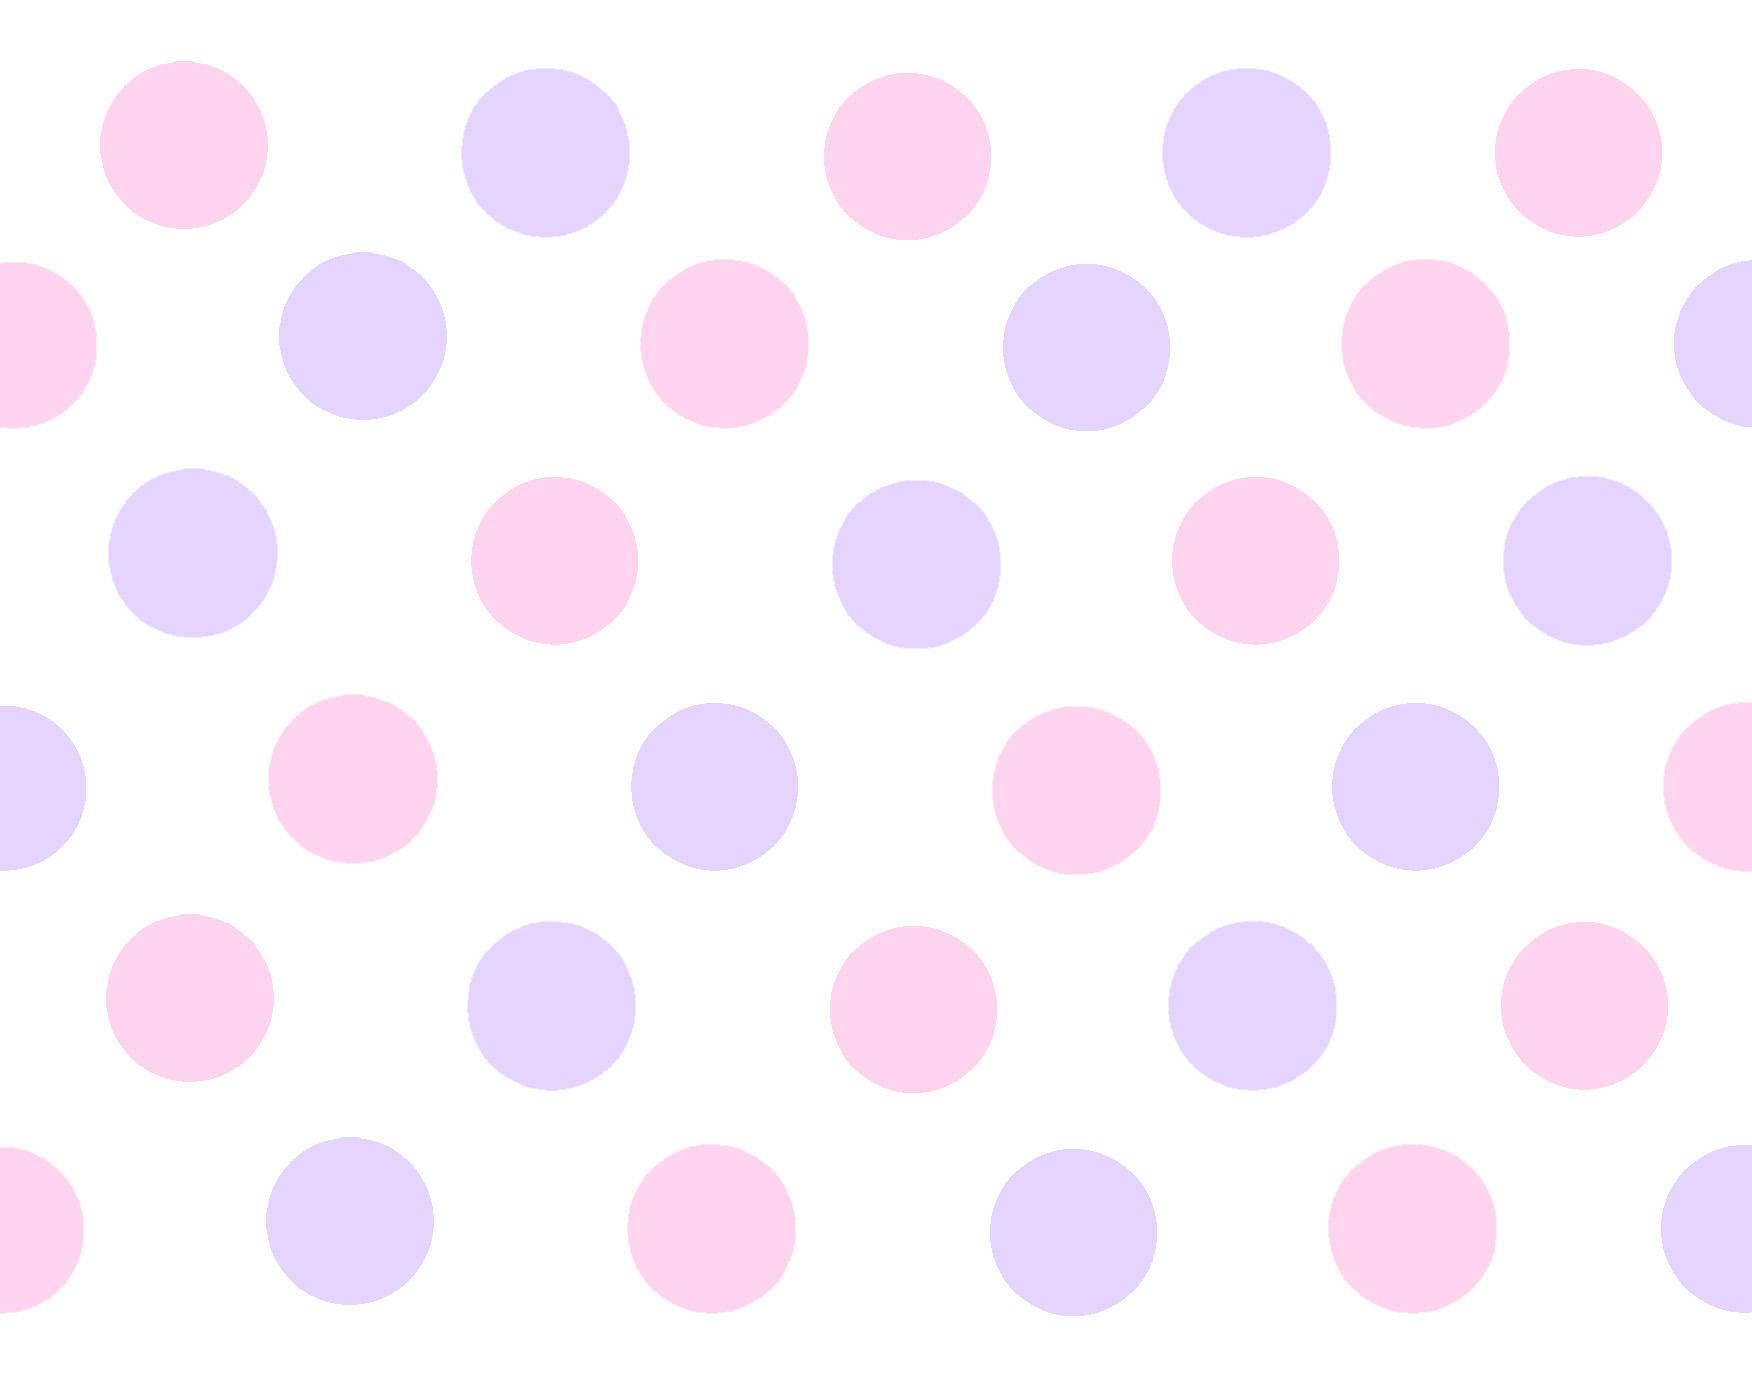 Dots clipart cute wallpaper Wallpaper WallpaperSafari purple Cute collection